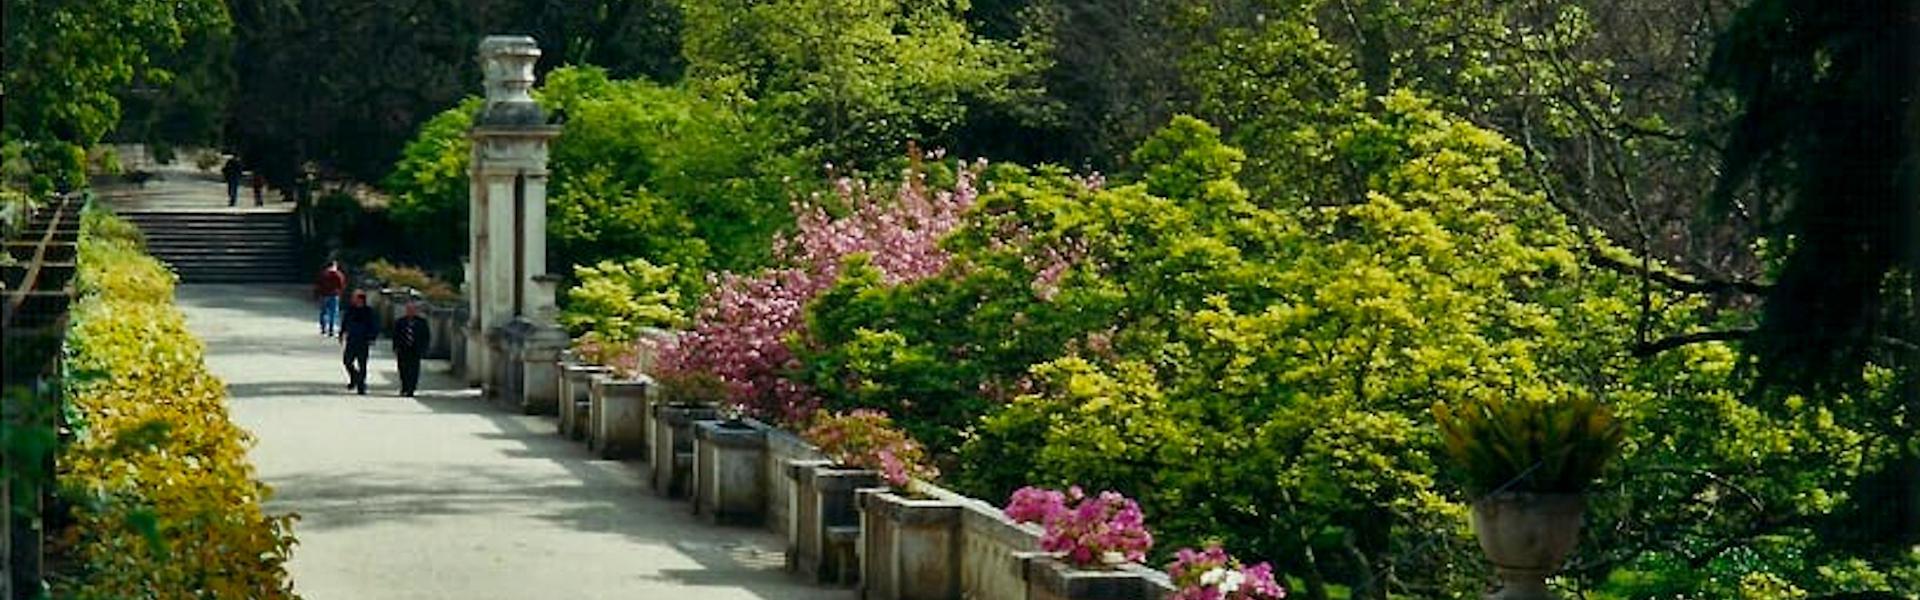 Reabertura do Jardim Botânico